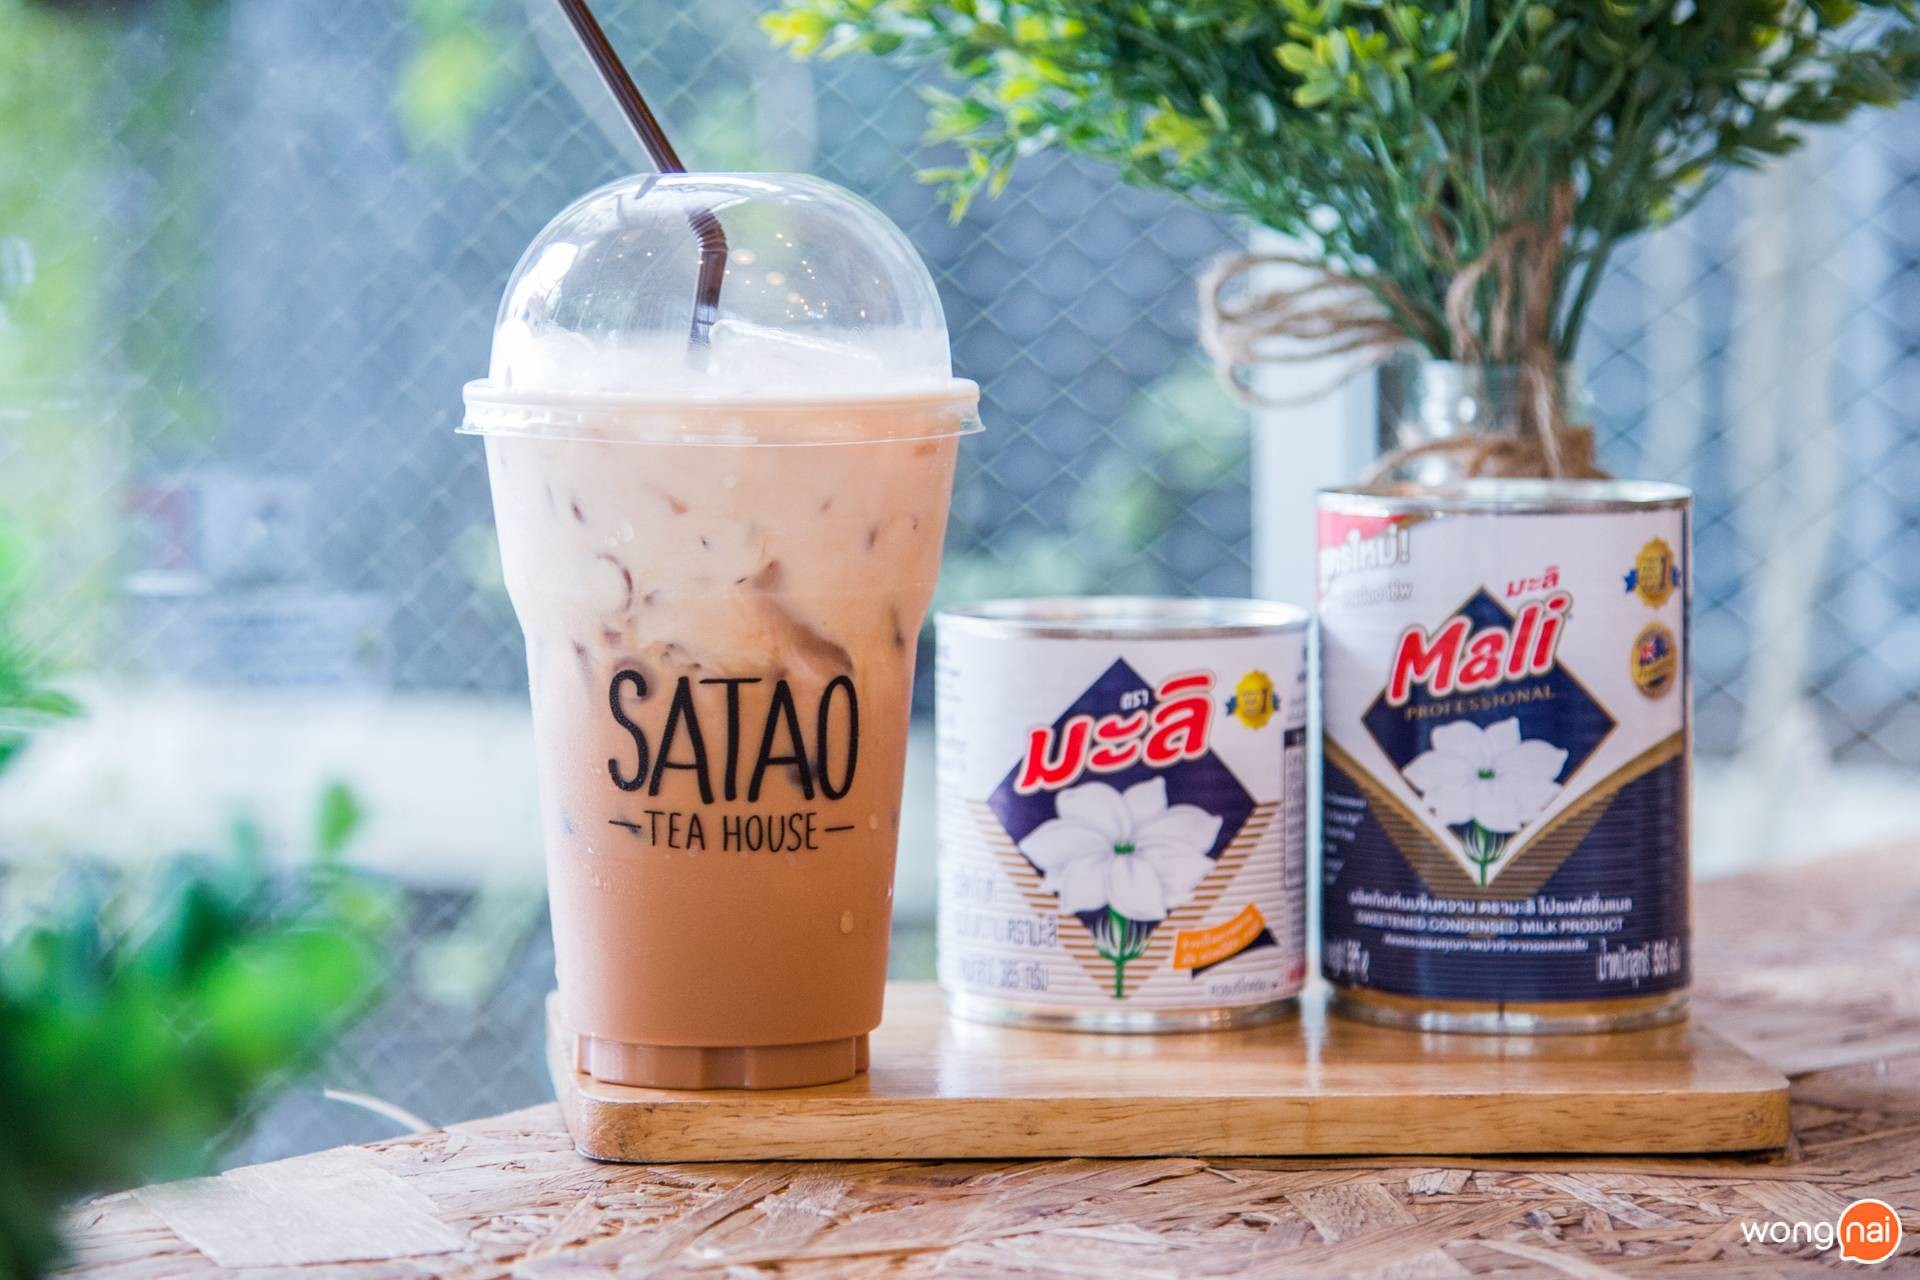 Satao Tea House